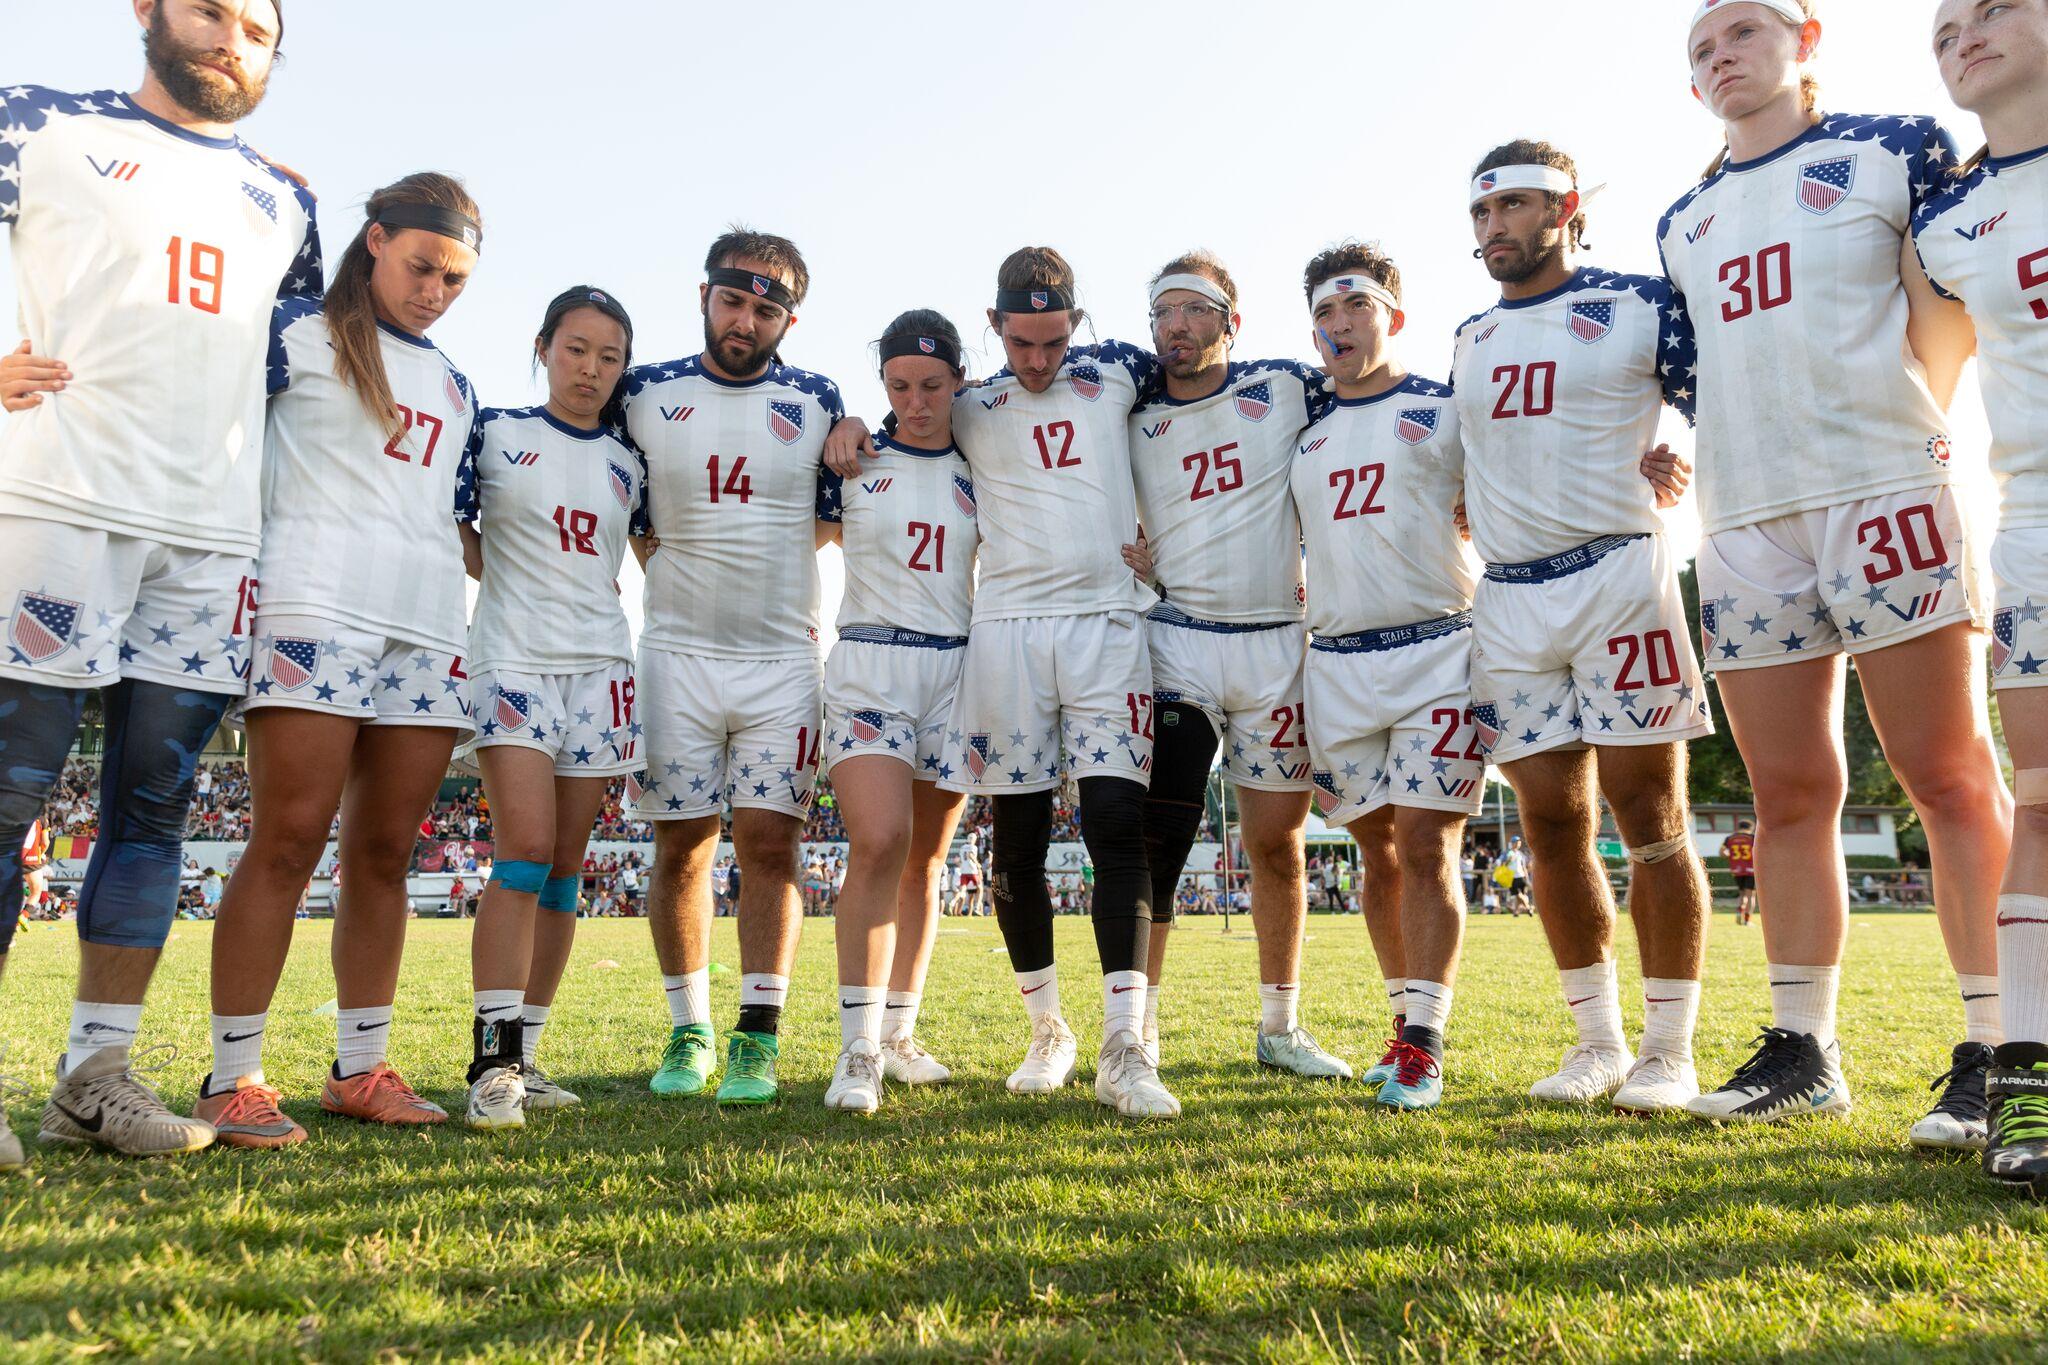 USA team before a game